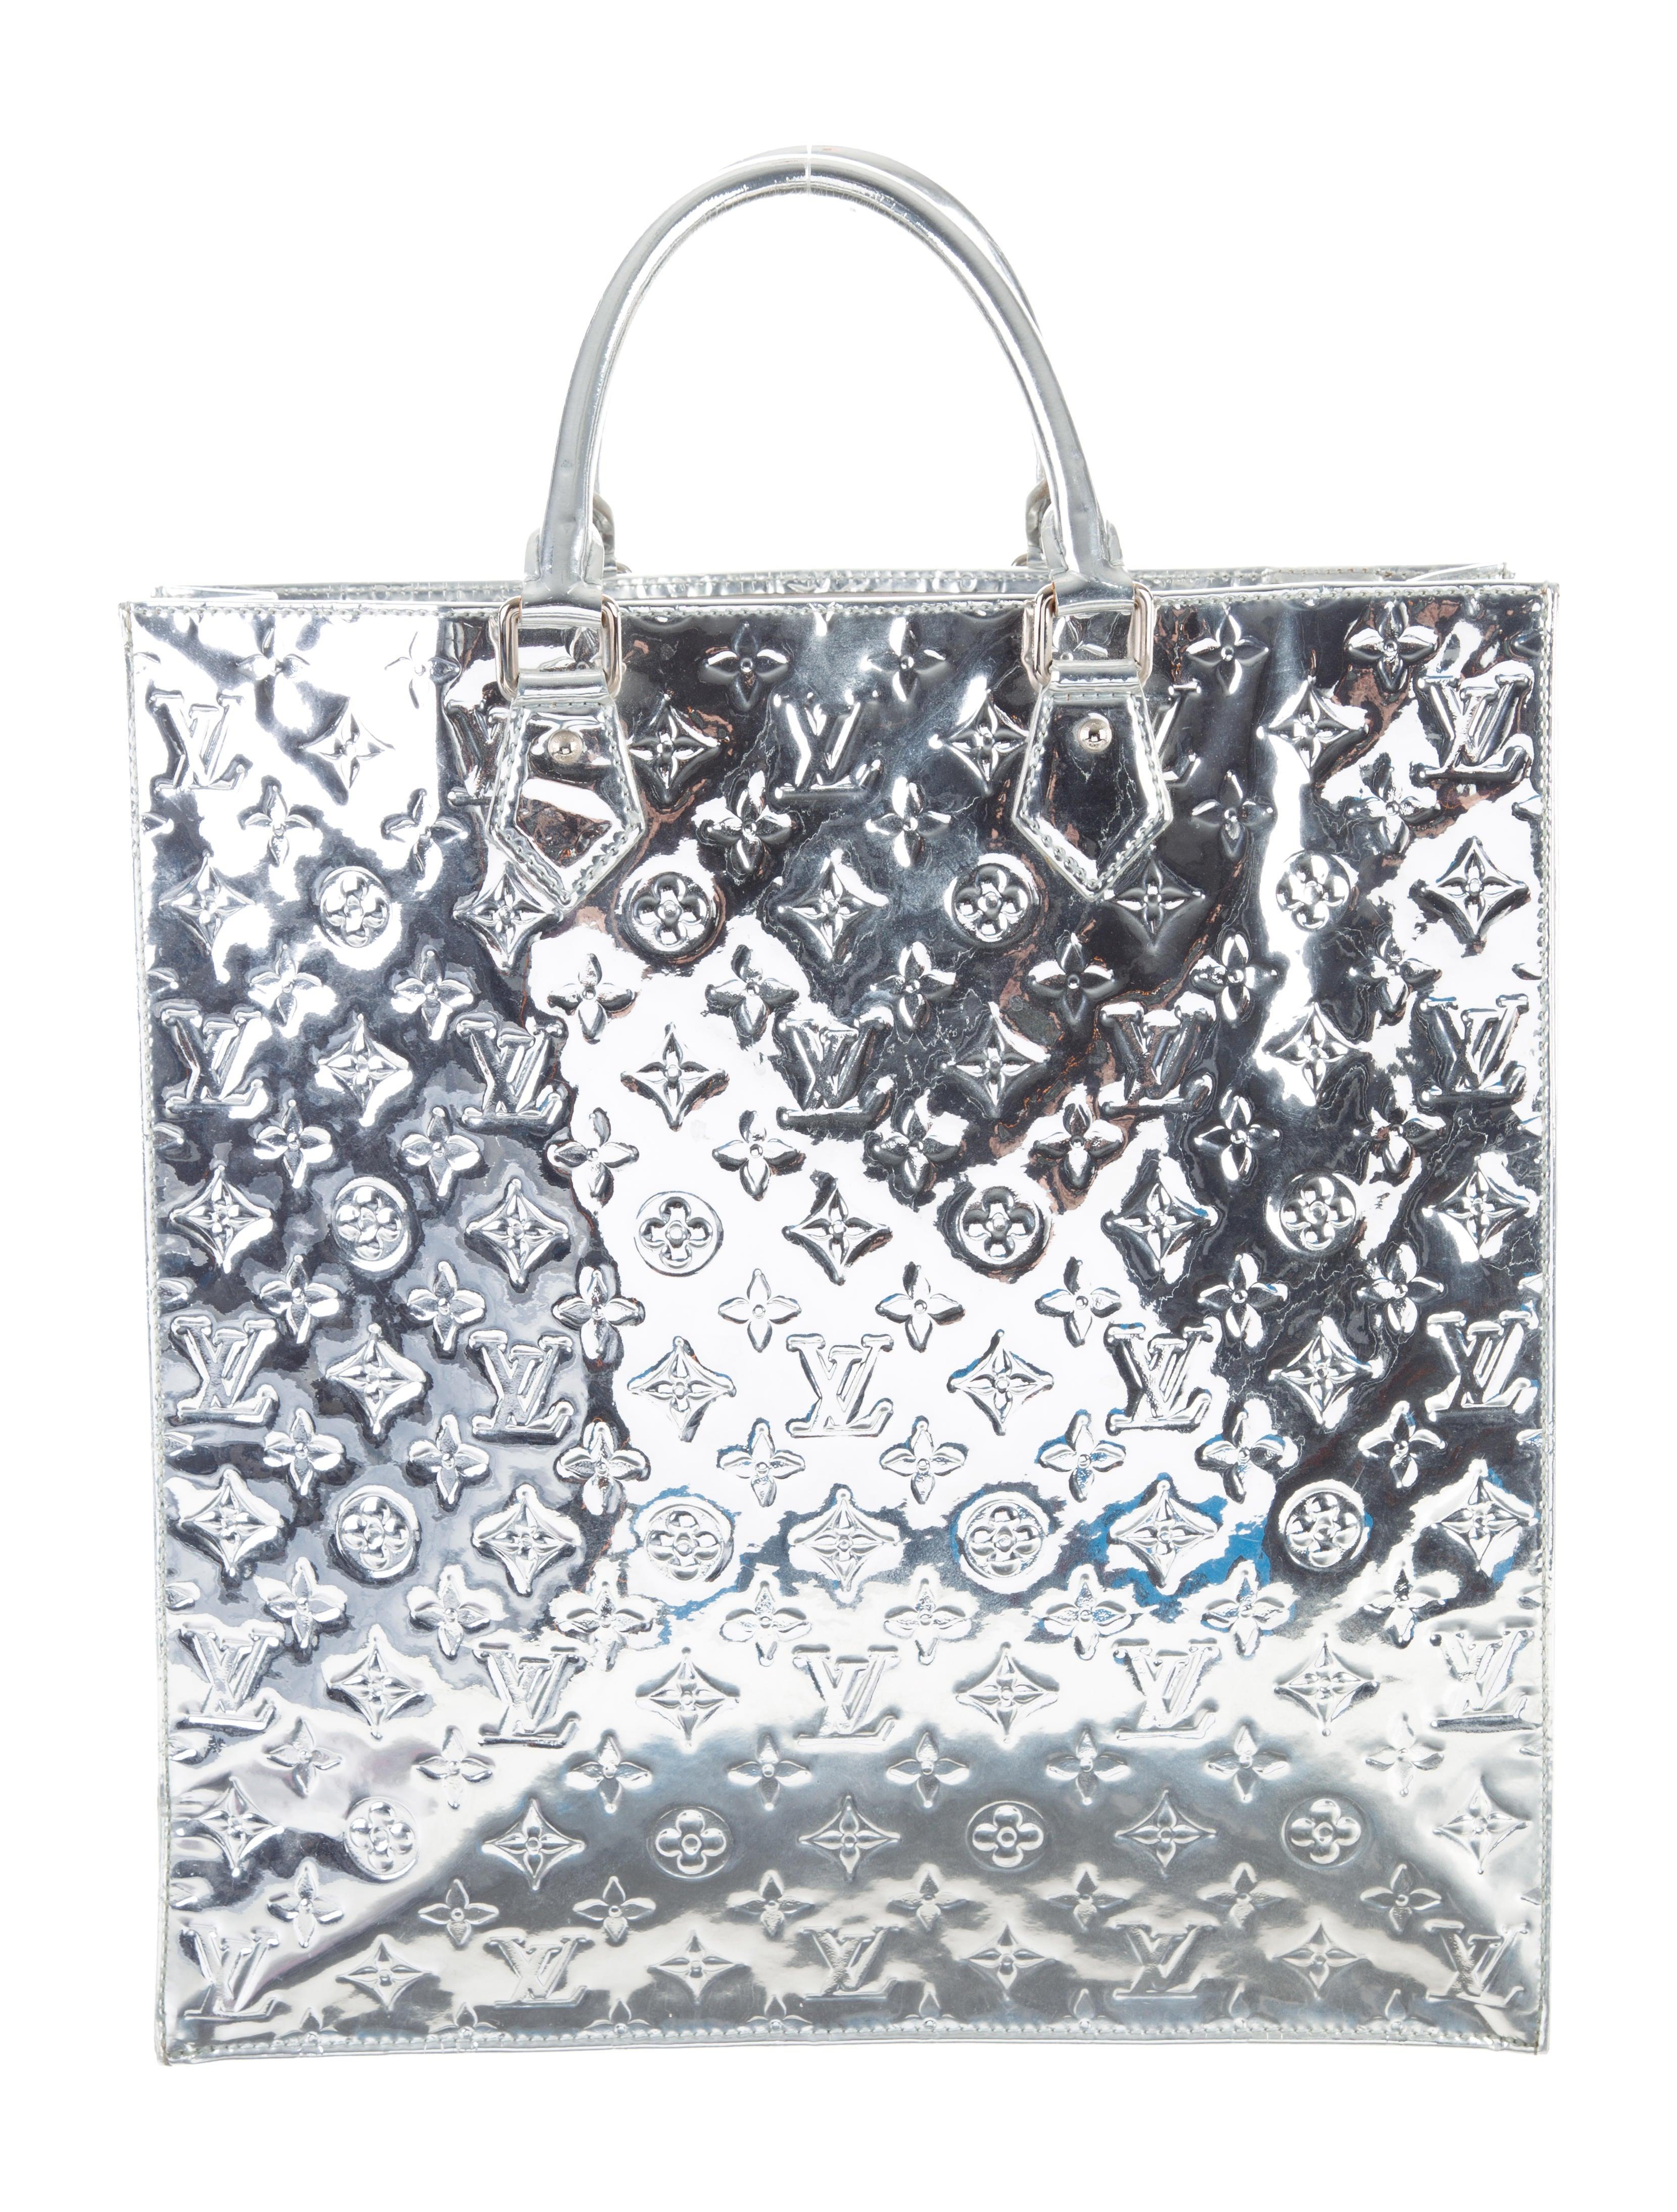 b9b942662af6 Louis Vuitton Miroir Sac Plat - Handbags - LOU192125